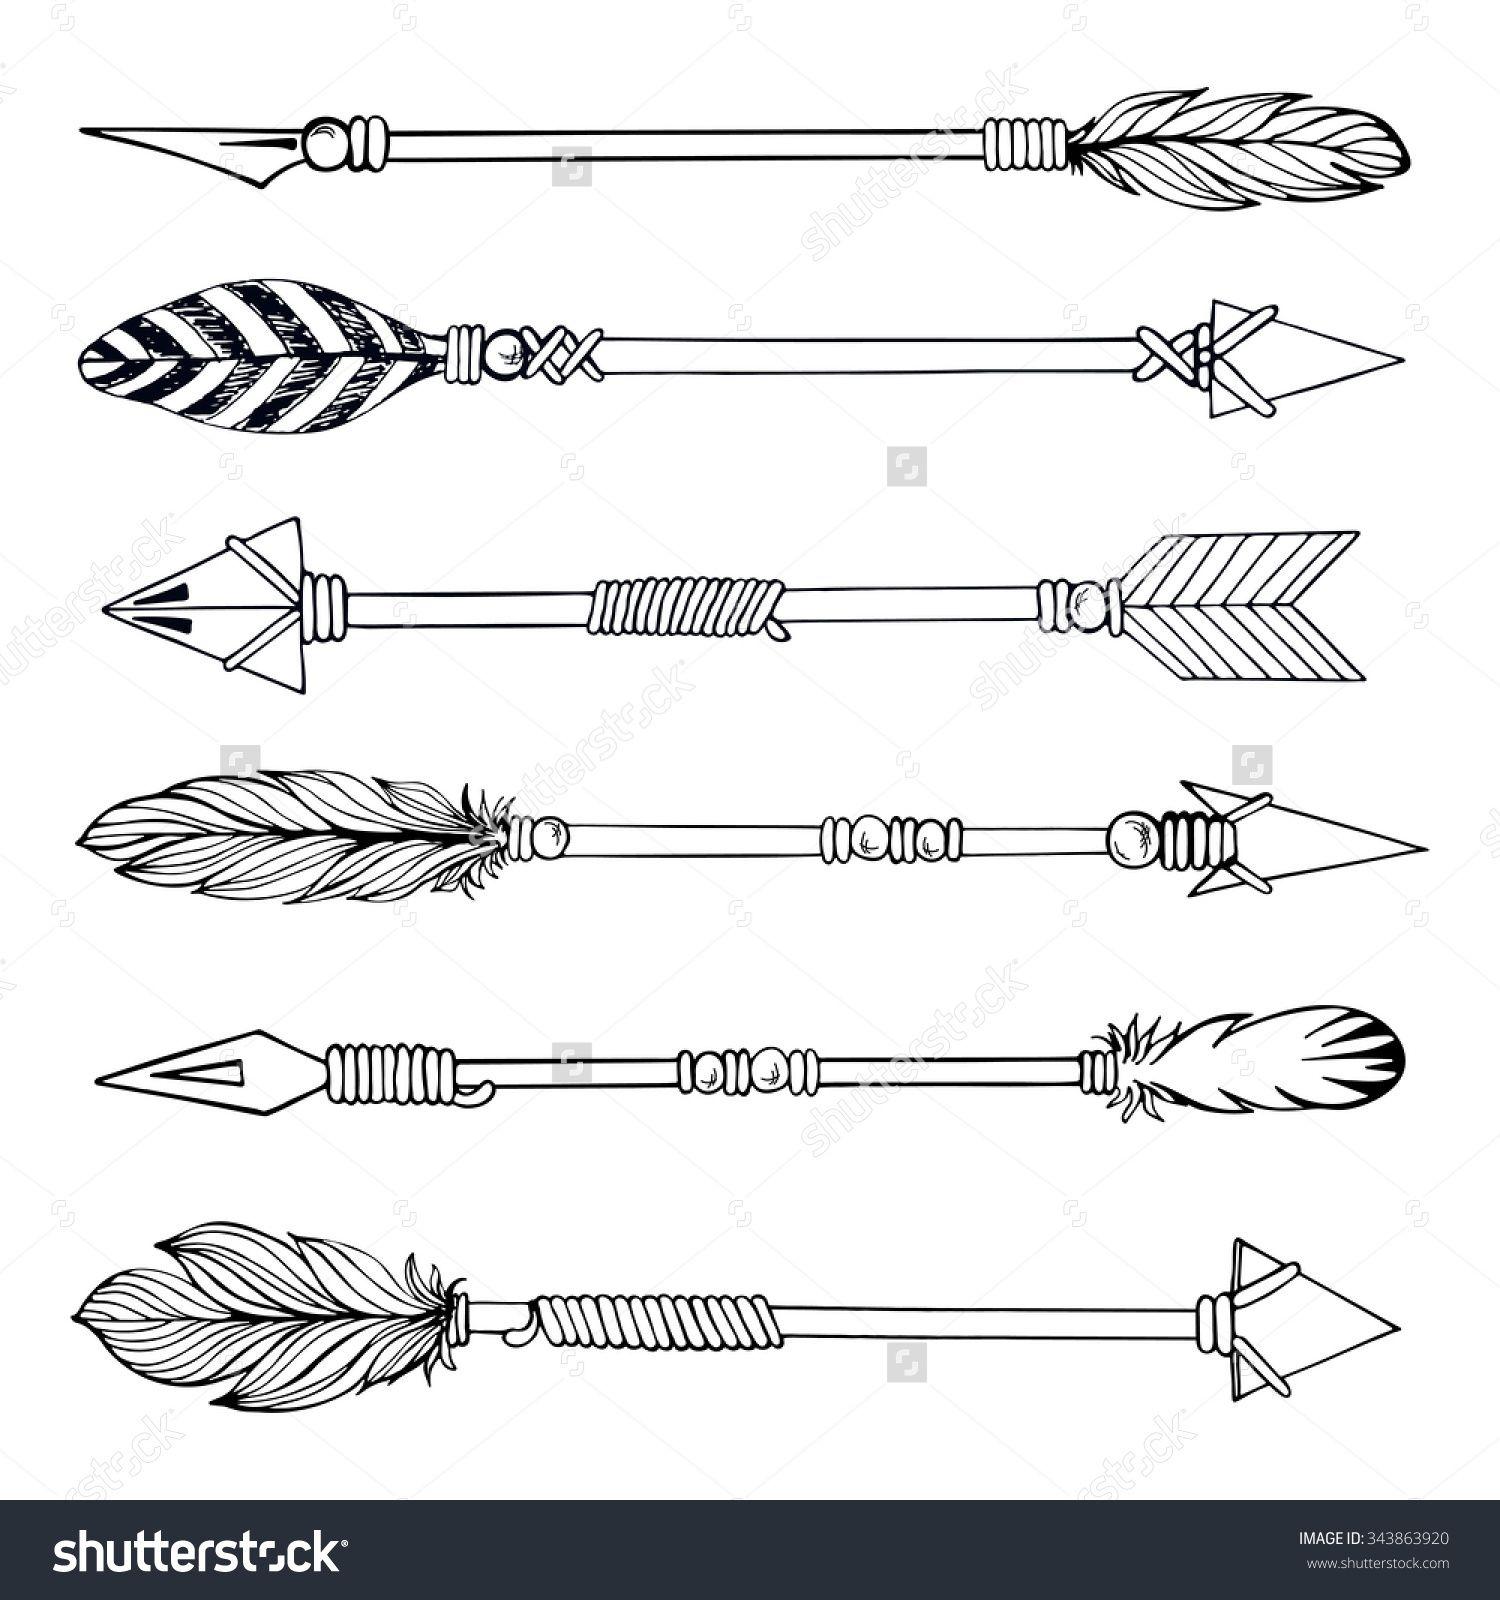 50 Beautiful Free Adobe Illustrator Vector Brushes